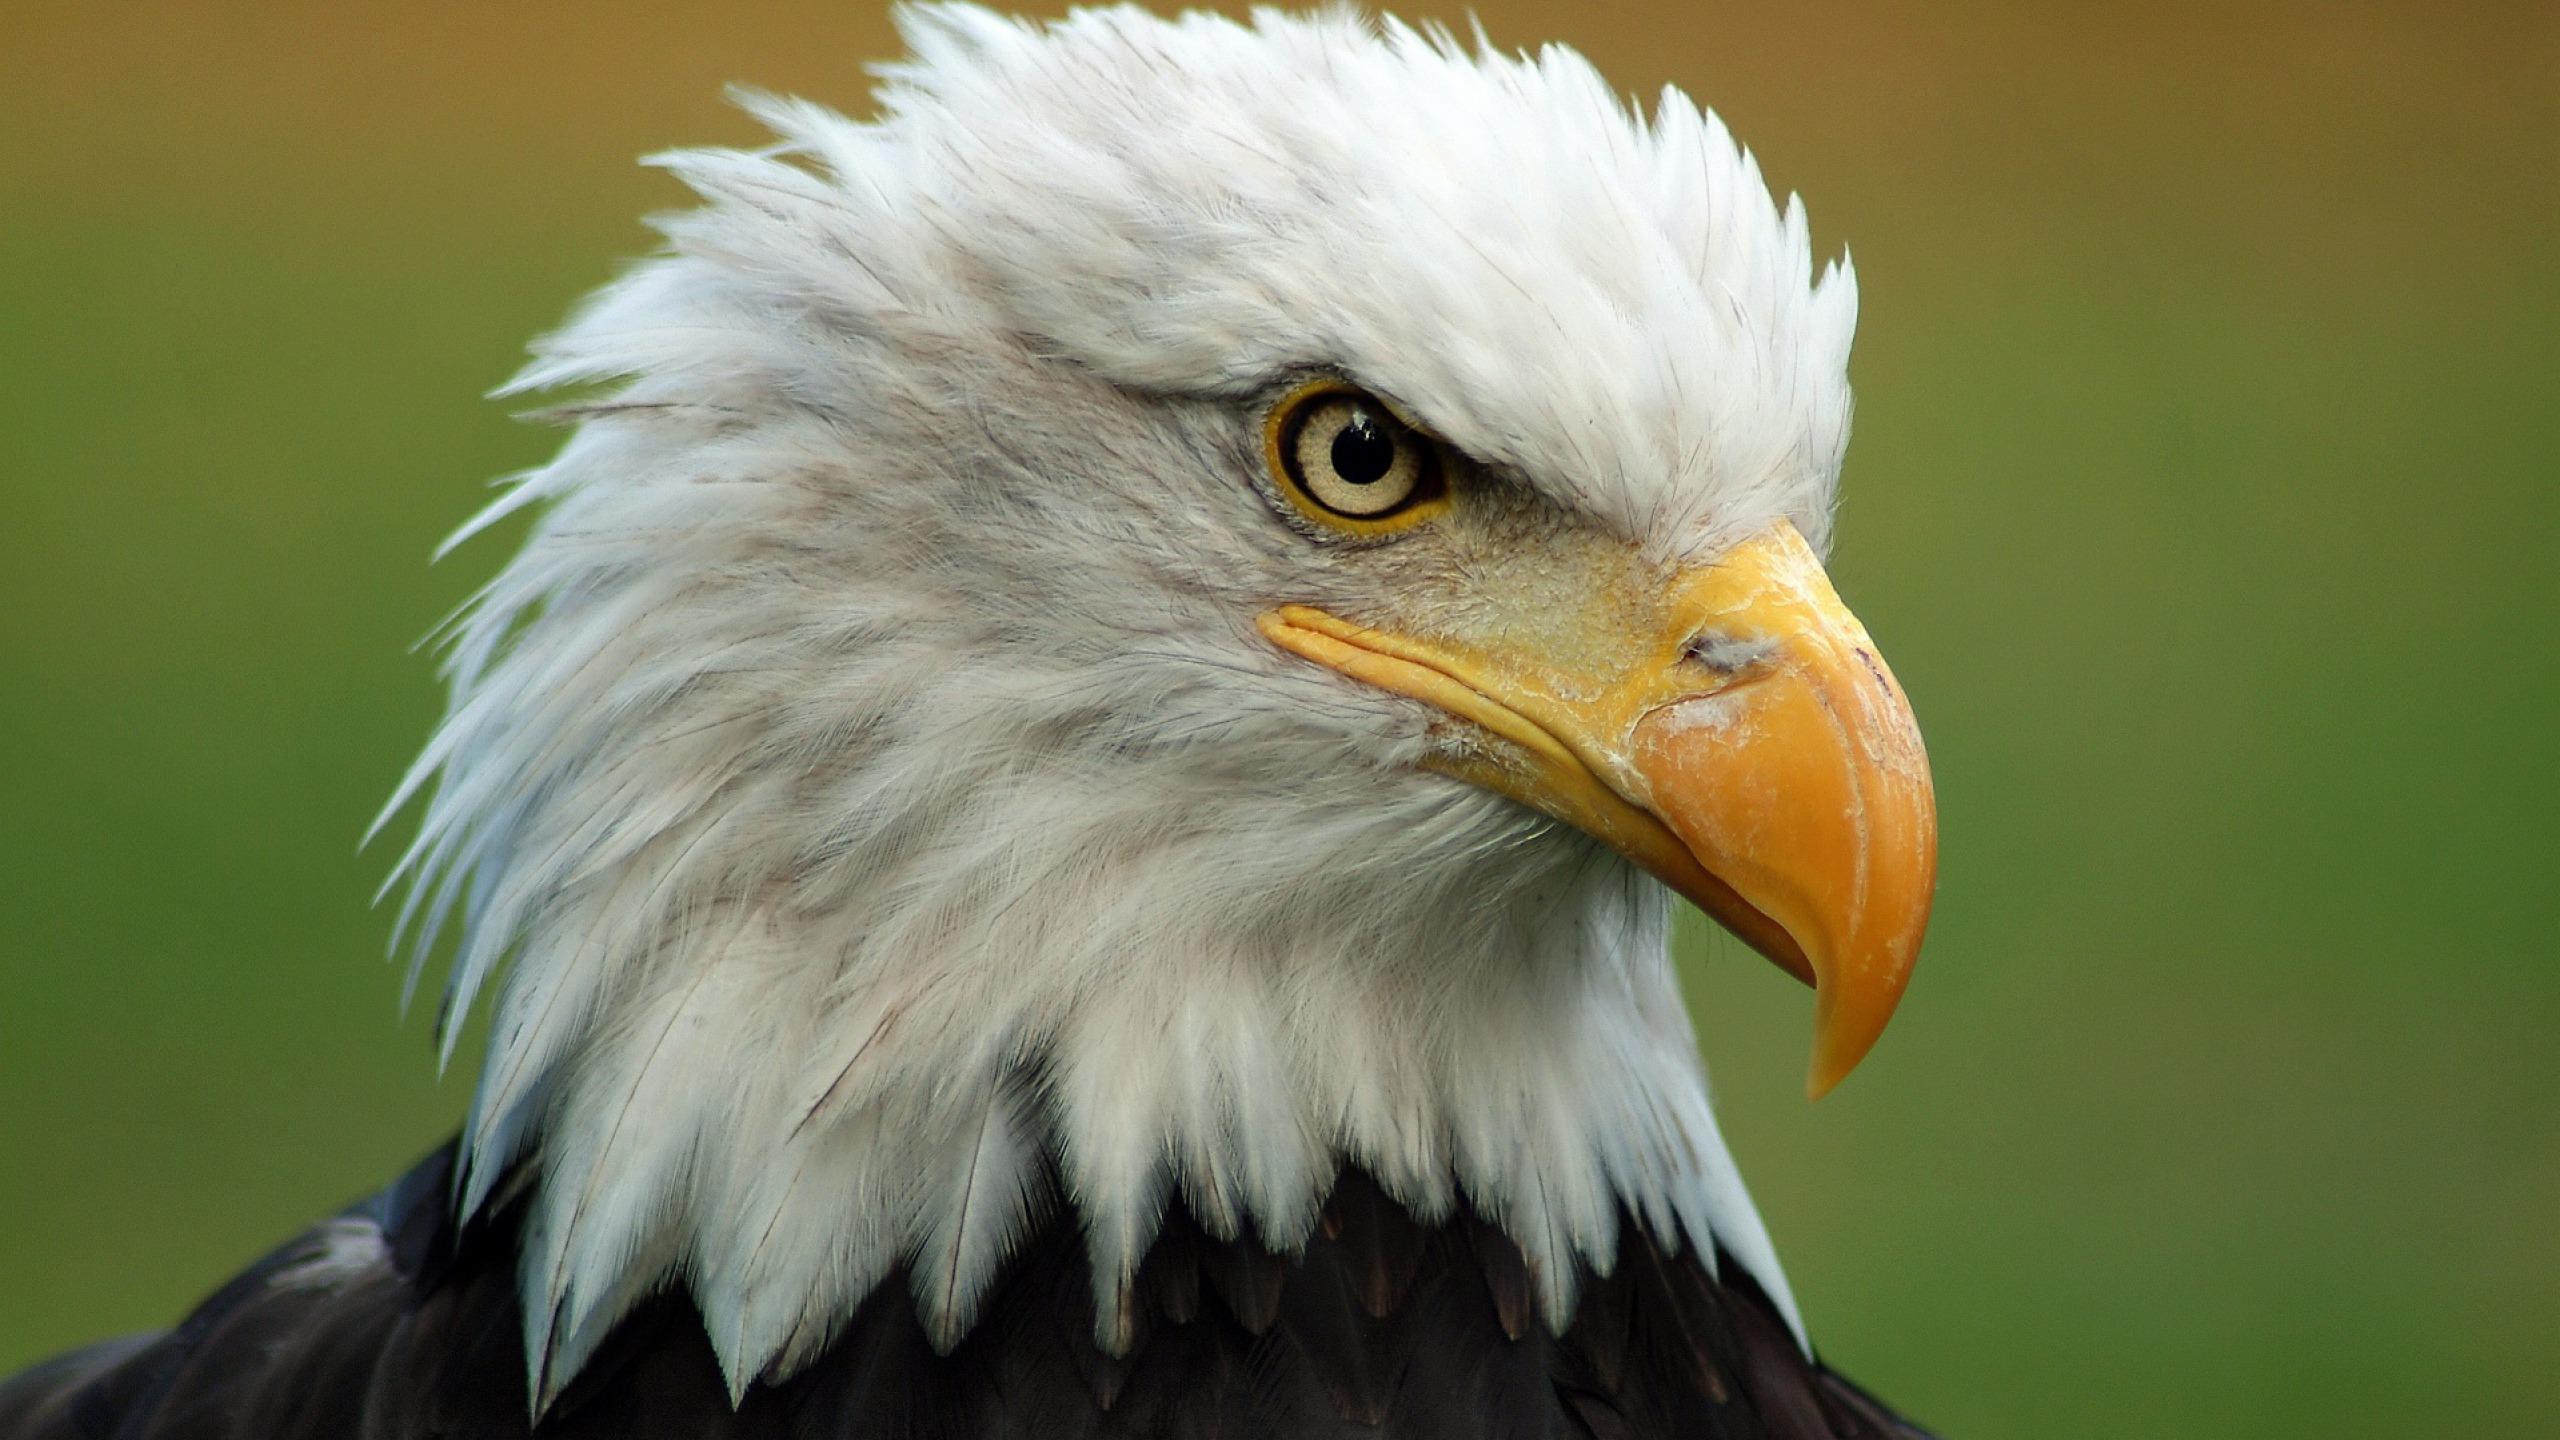 eagle flag wallpaper american portrait 2560x1440 2560x1440